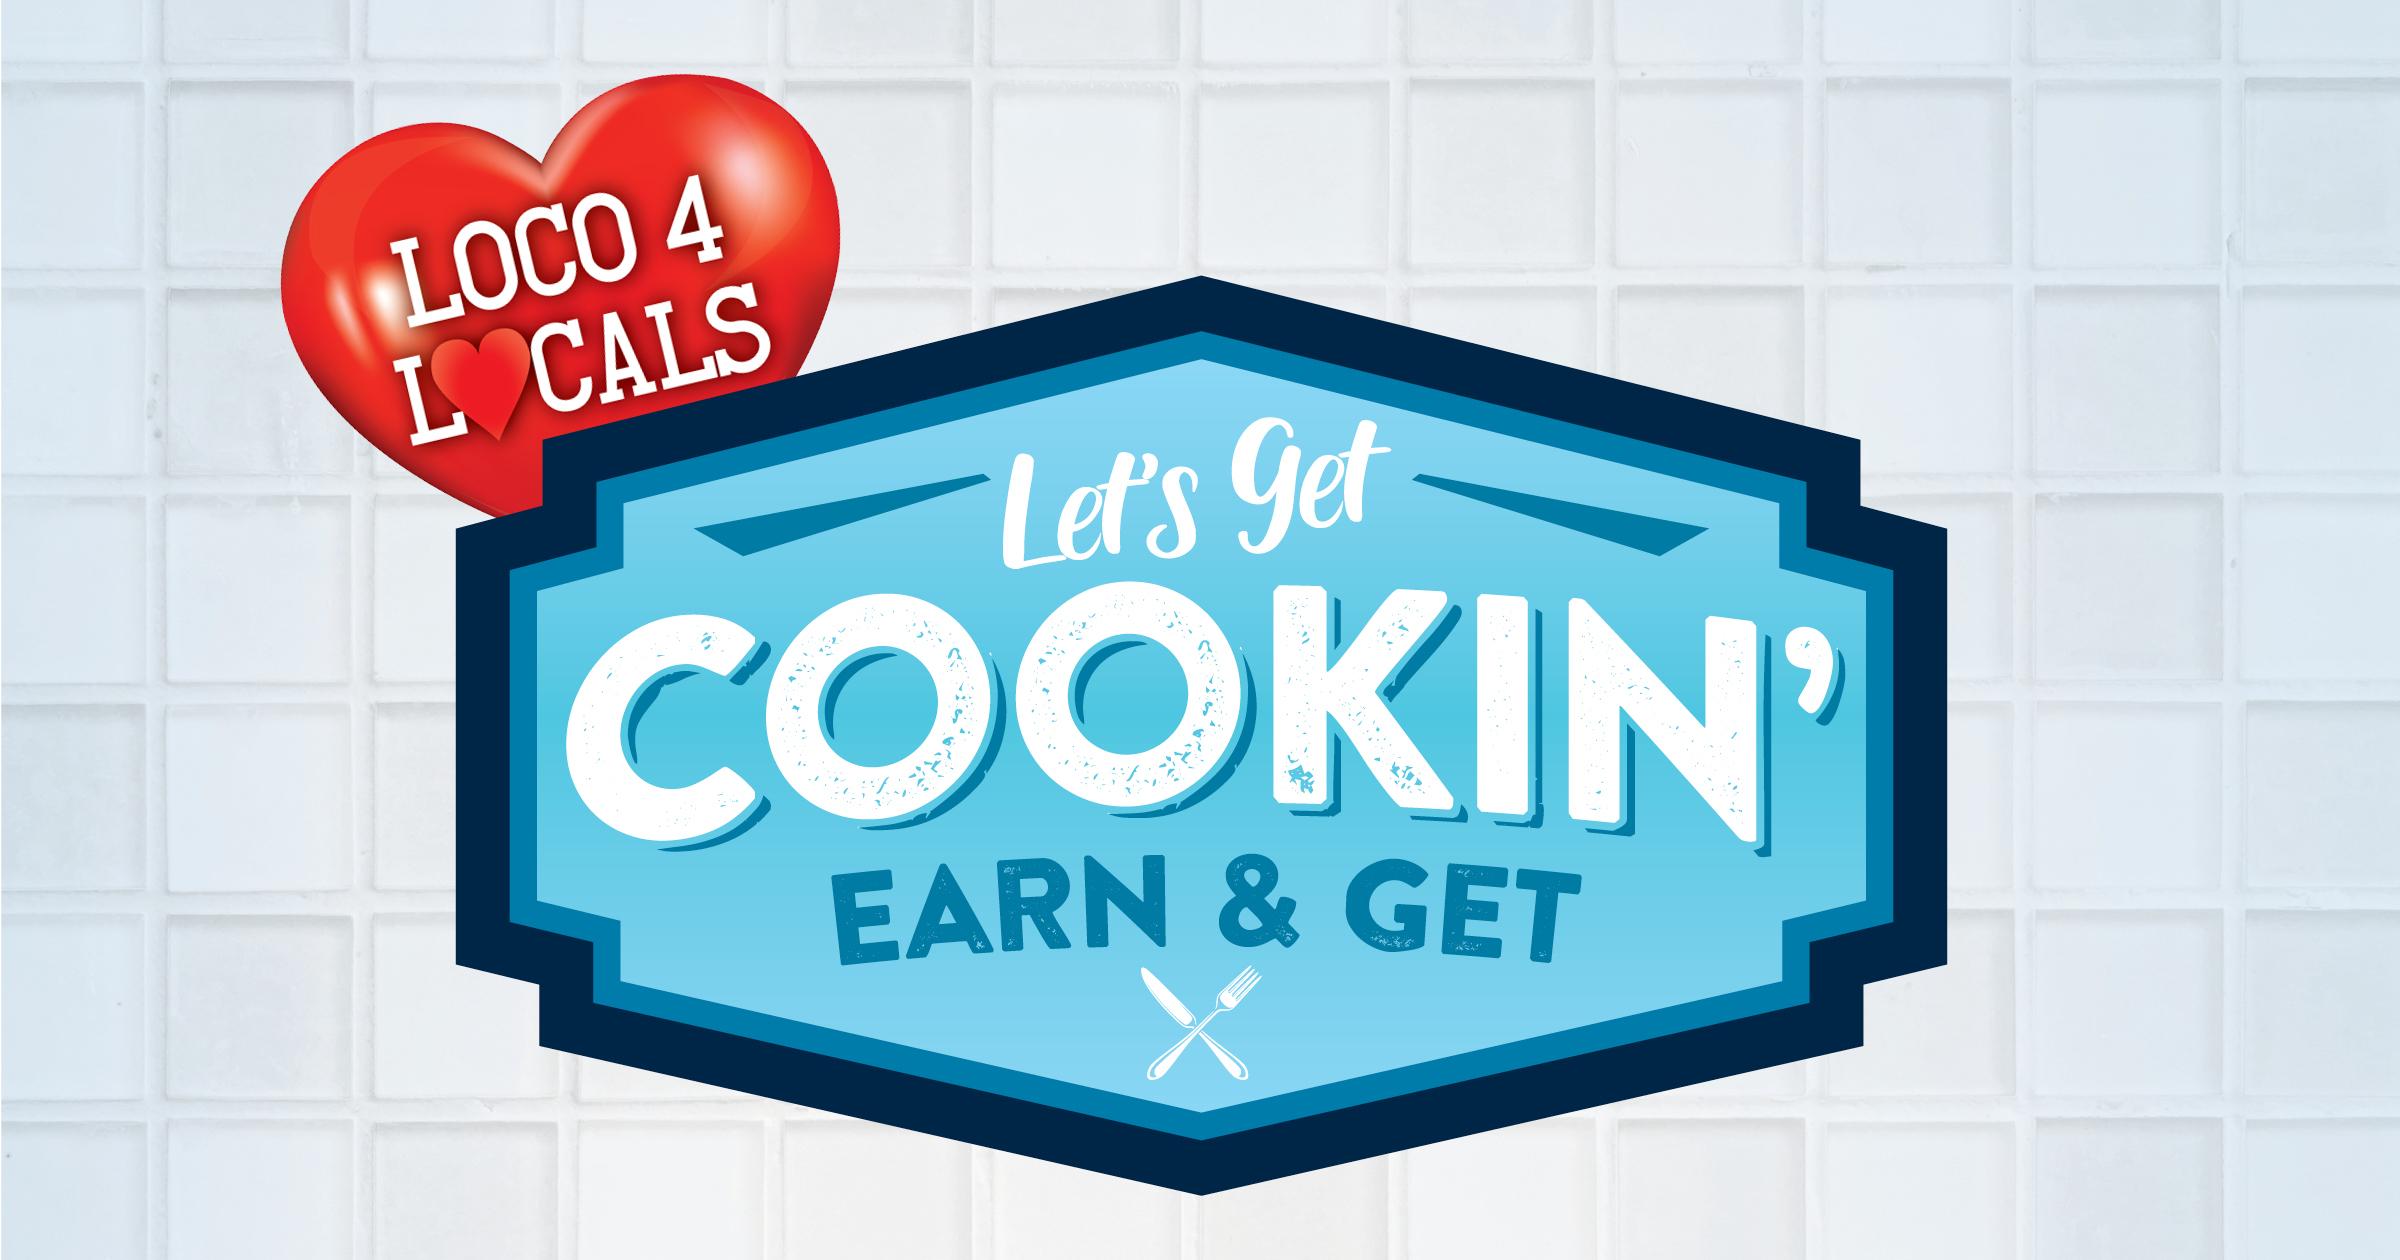 Loco 4 Locals – Let's Get Cookin' Earn & Get